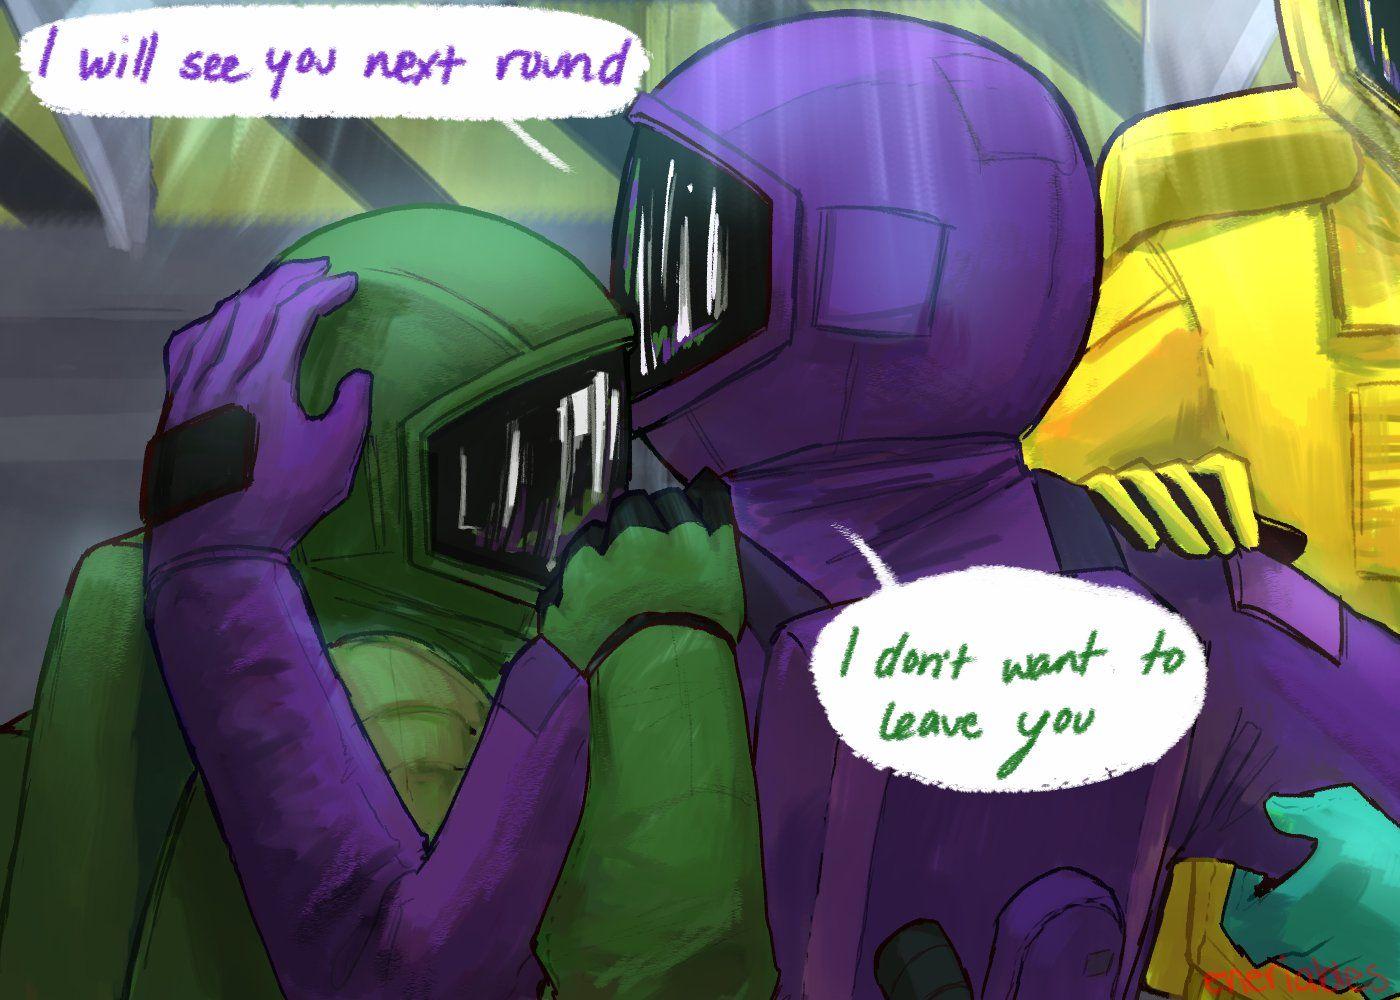 Pin By Lia Carballo On Among Us In 2020 Dark Jokes Memes Cute Comics